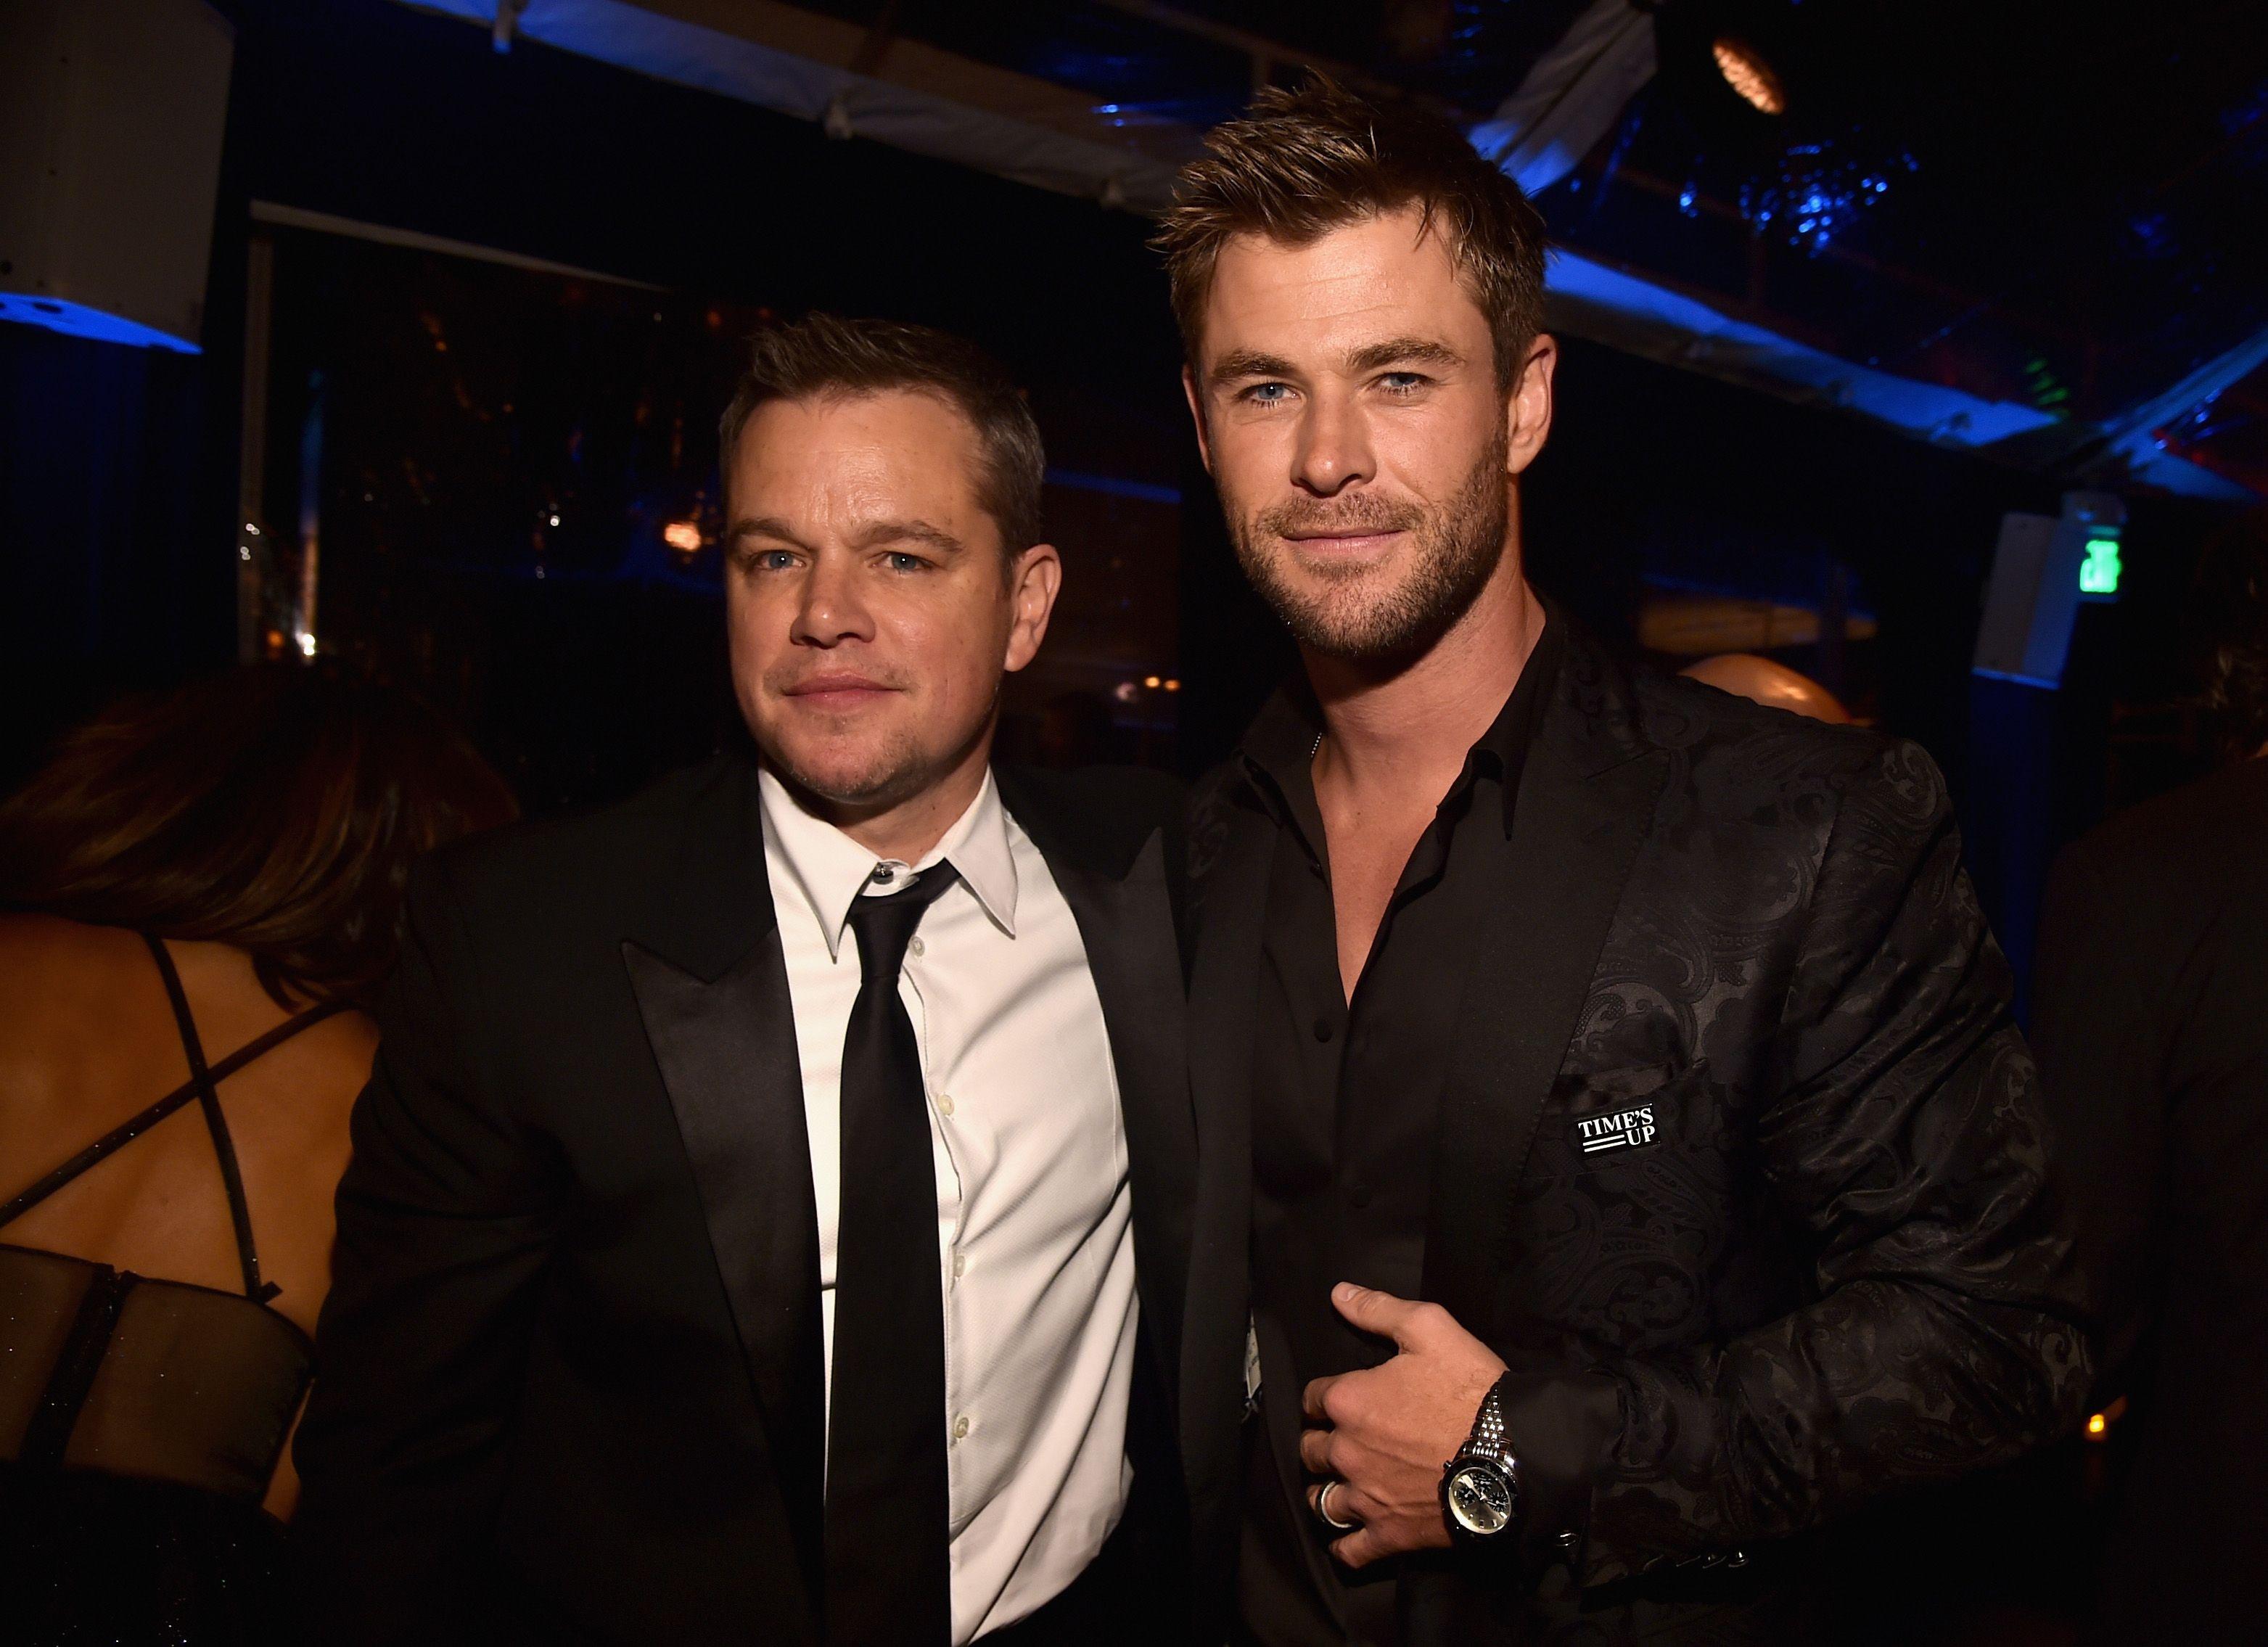 Chris Hemsworth y Matt Damon, en modo Ojo de Halcón en Instagram